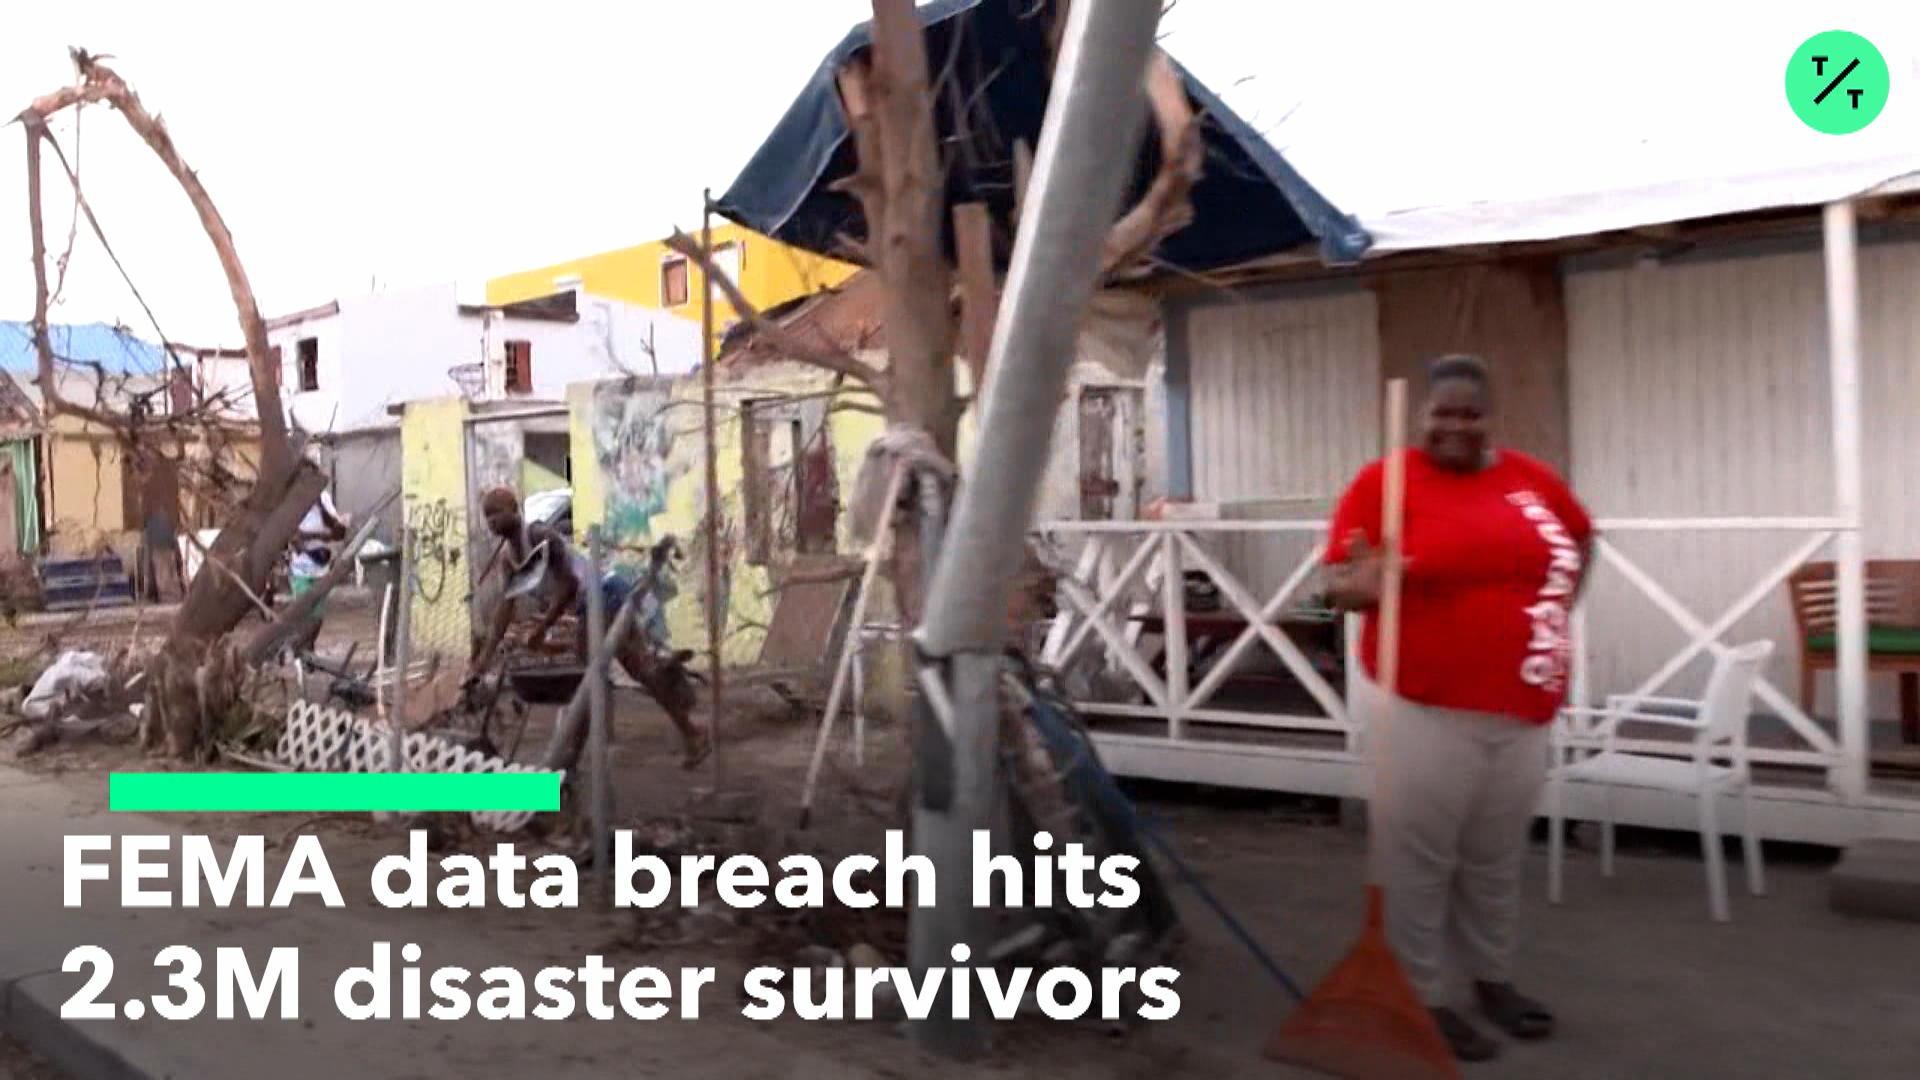 FEMA Data Breach Hits 2.3M People